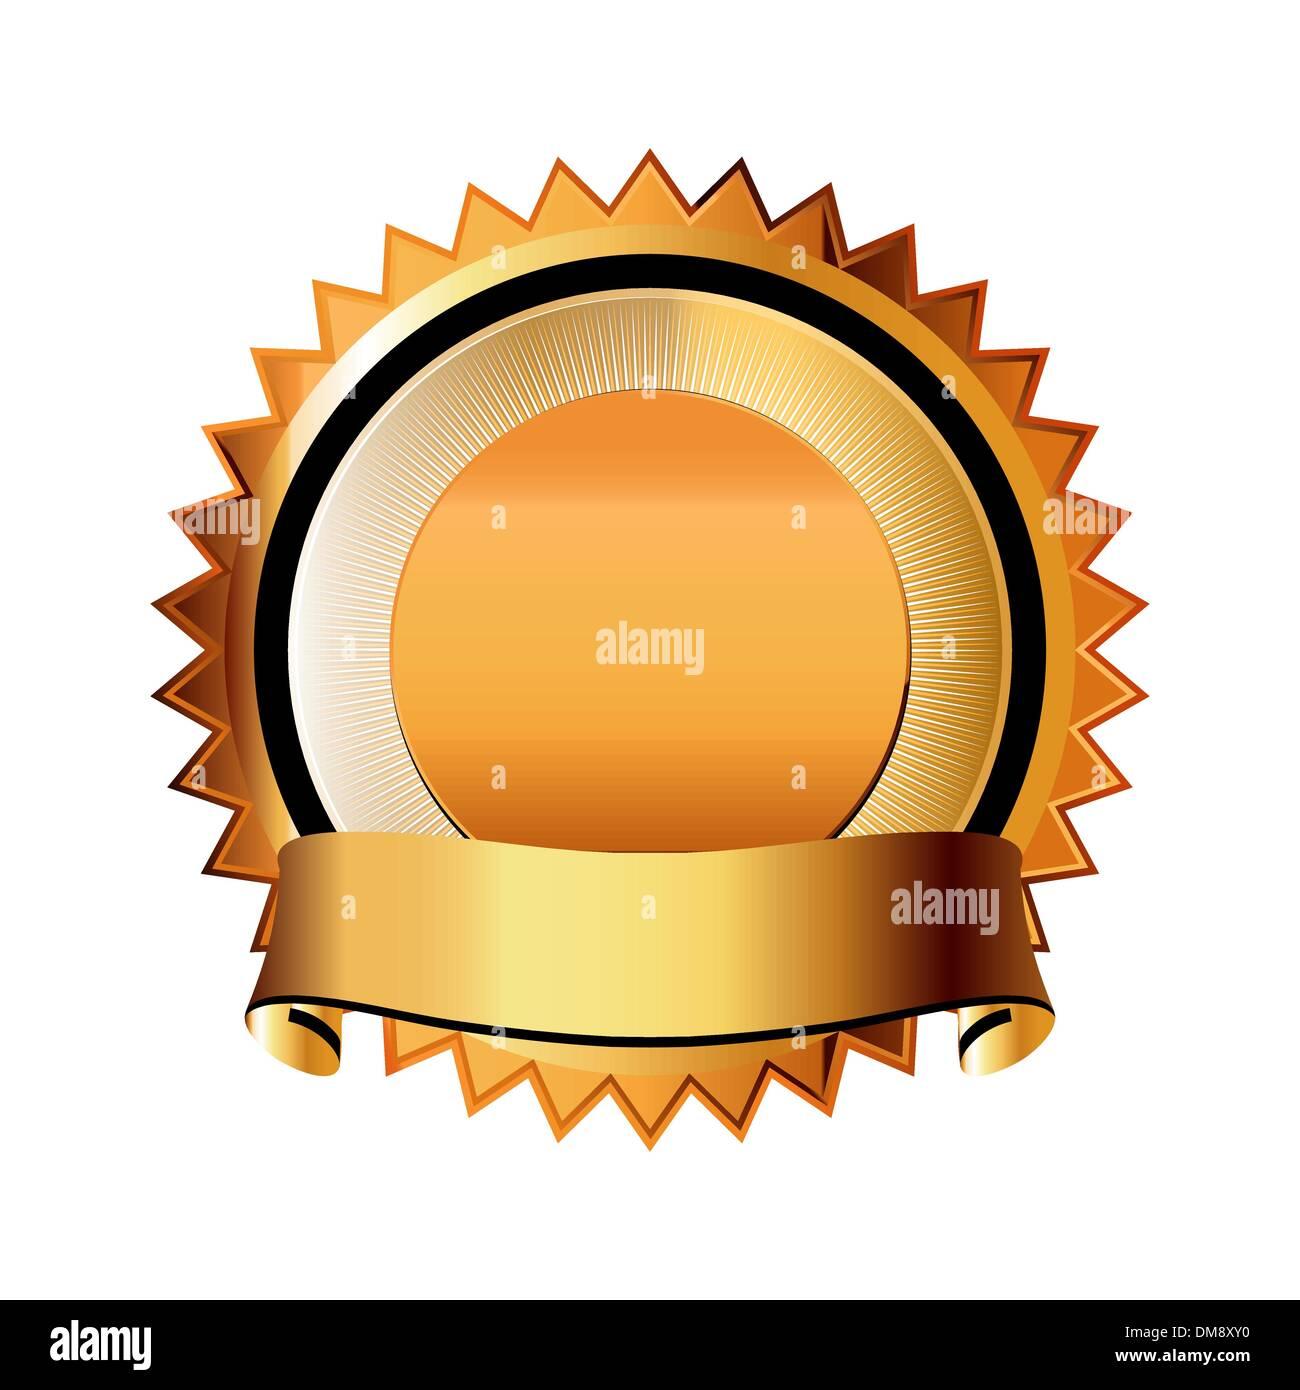 A Satisfaction Guaranteed seal. EPS 8 - Stock Image